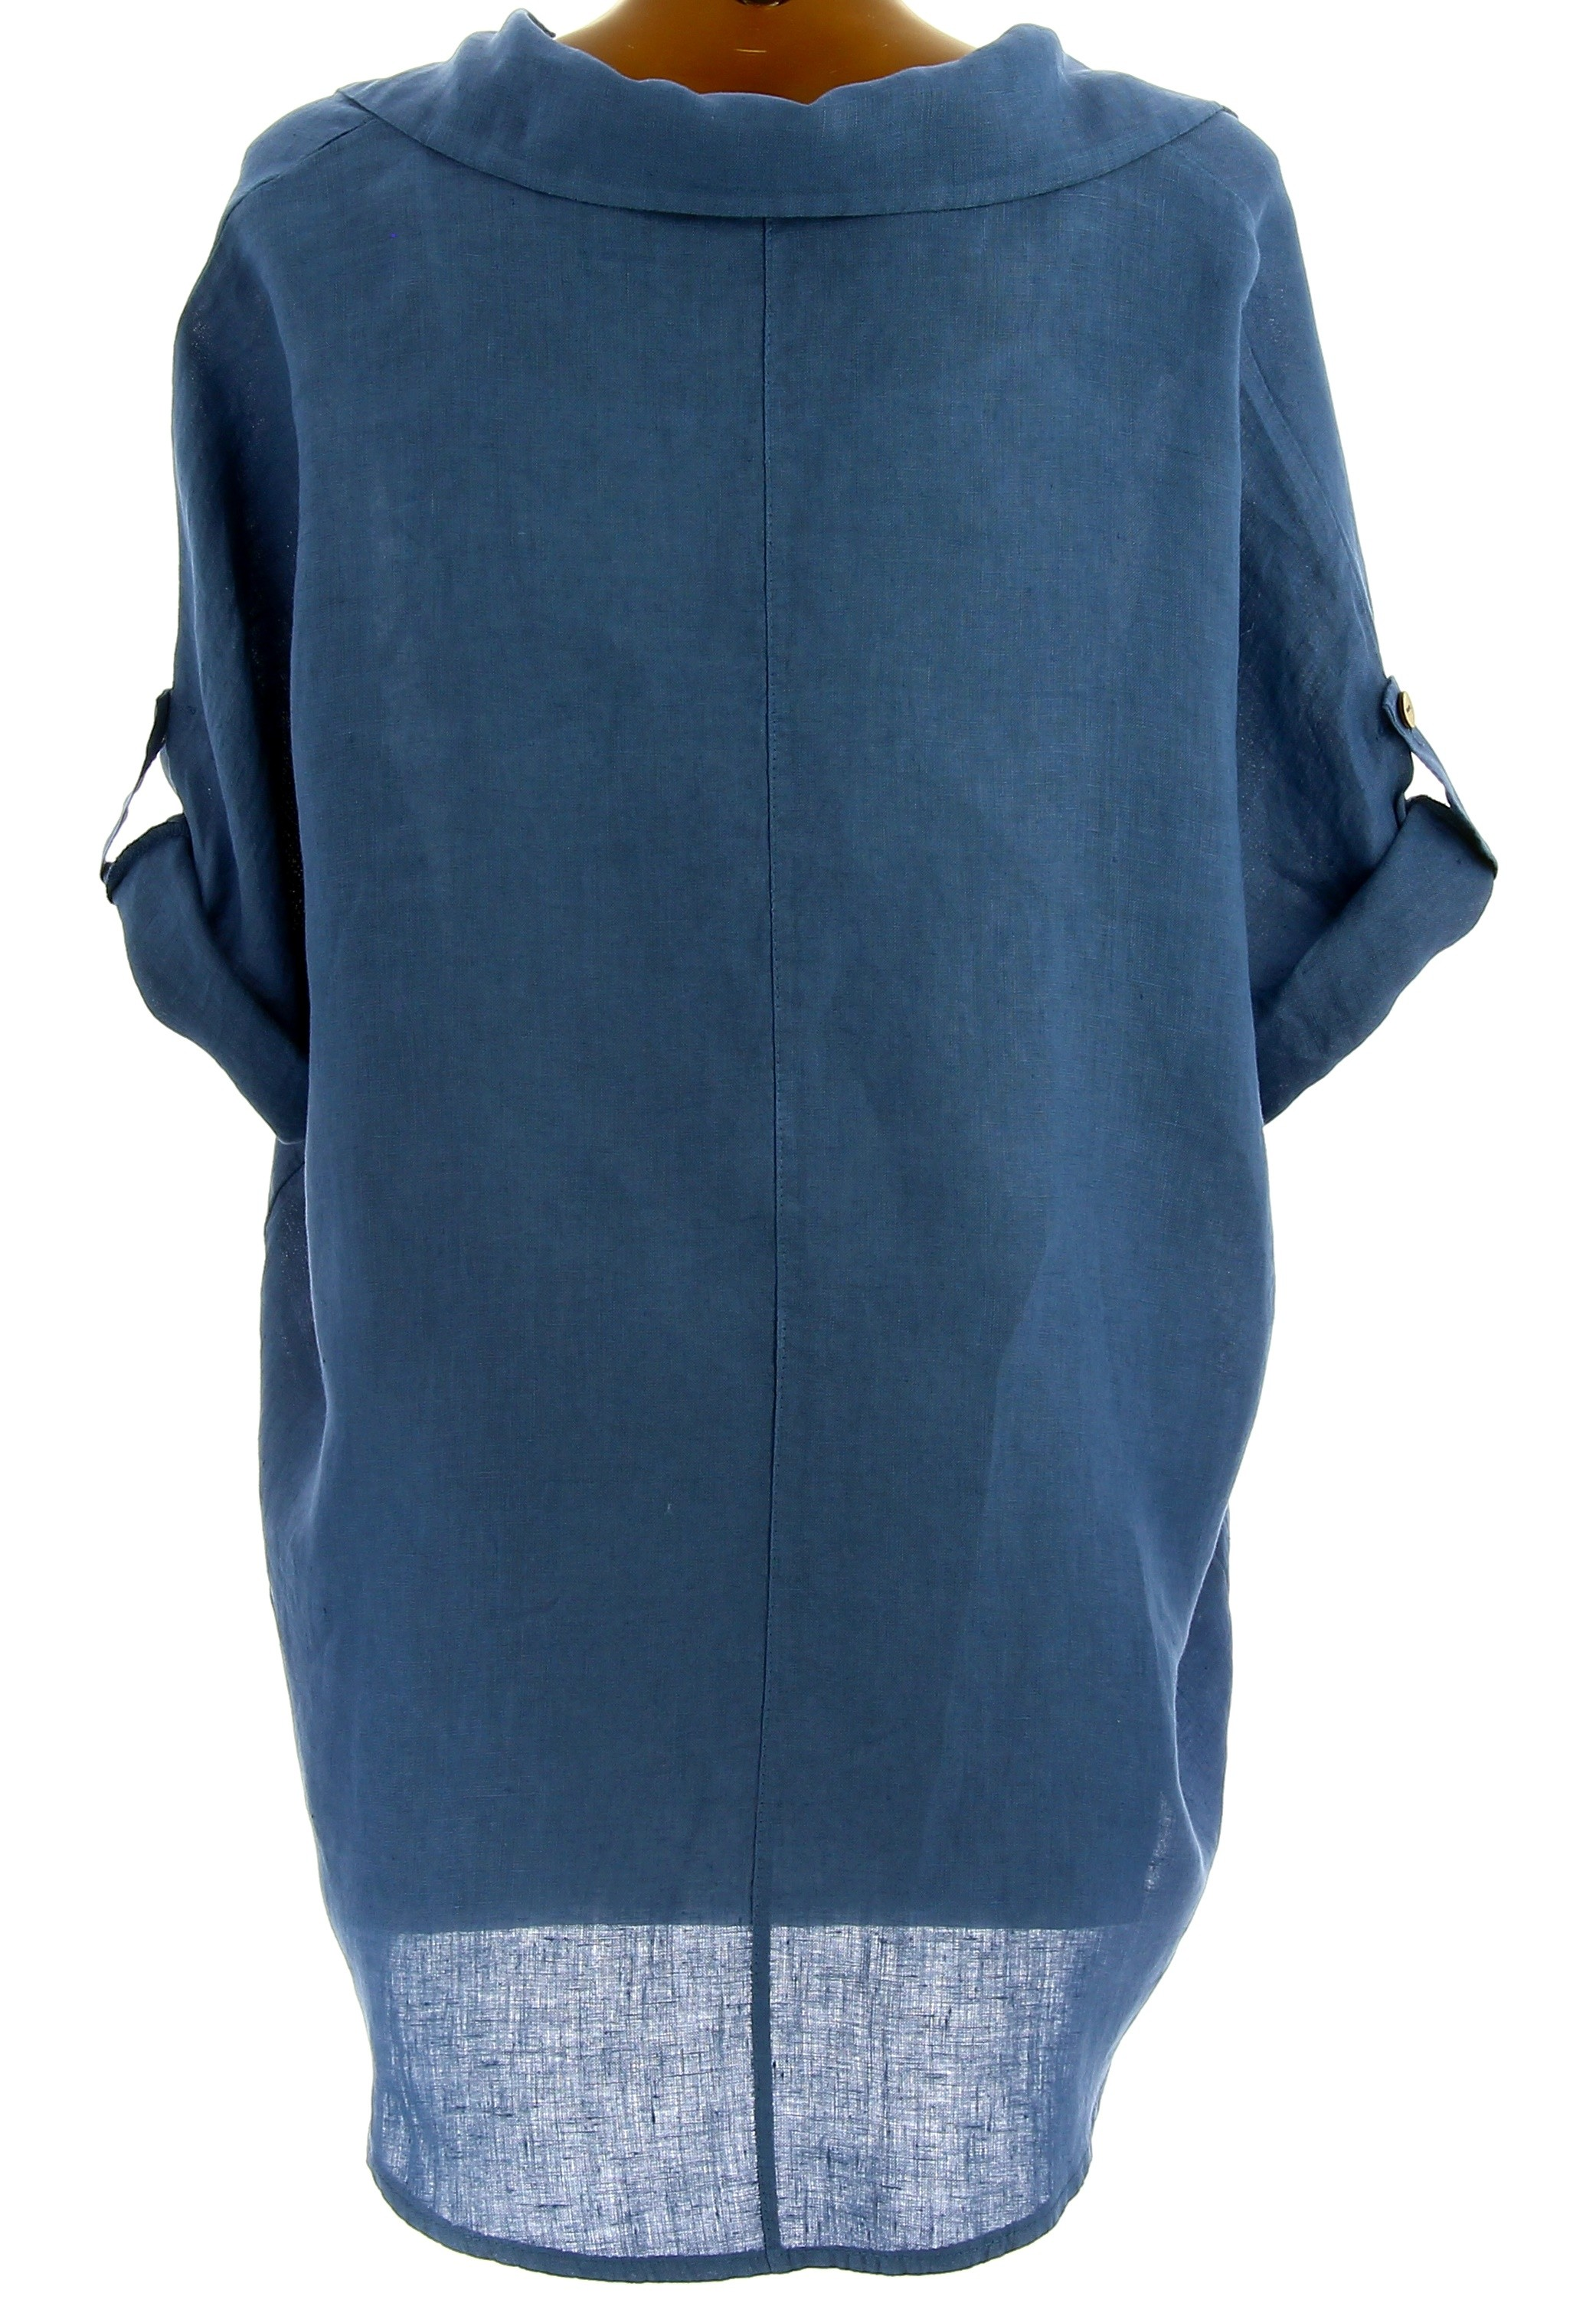 chemise femme lin t tunique boh me grande taille bleu jean perigord. Black Bedroom Furniture Sets. Home Design Ideas